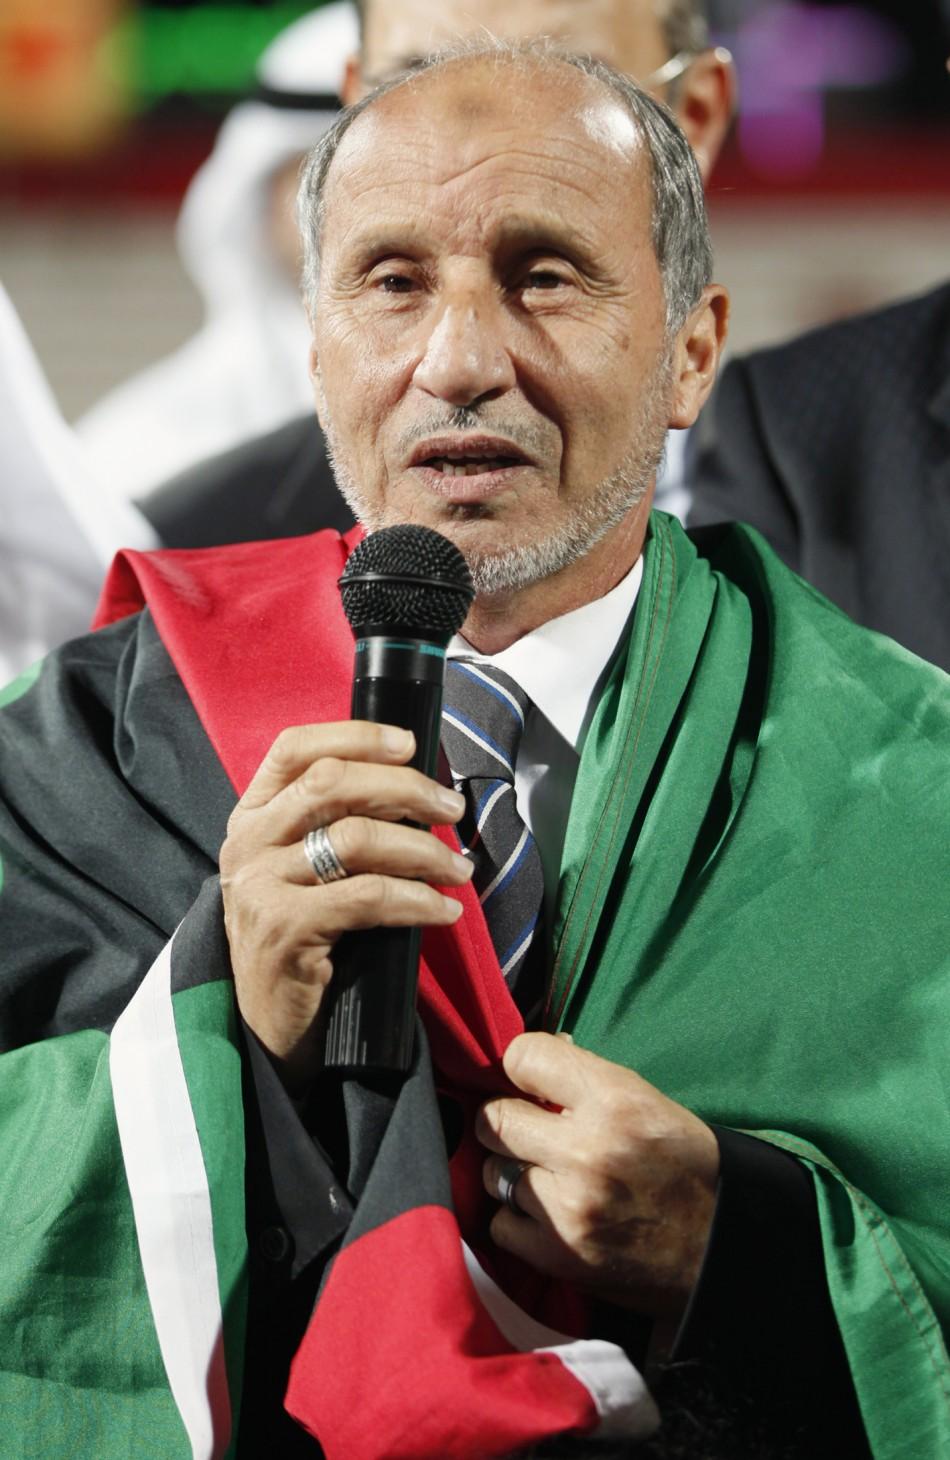 Libya's National Transitional Council Chairman Mustafa Abdul Jalil speaks during a charity football match in Dubai